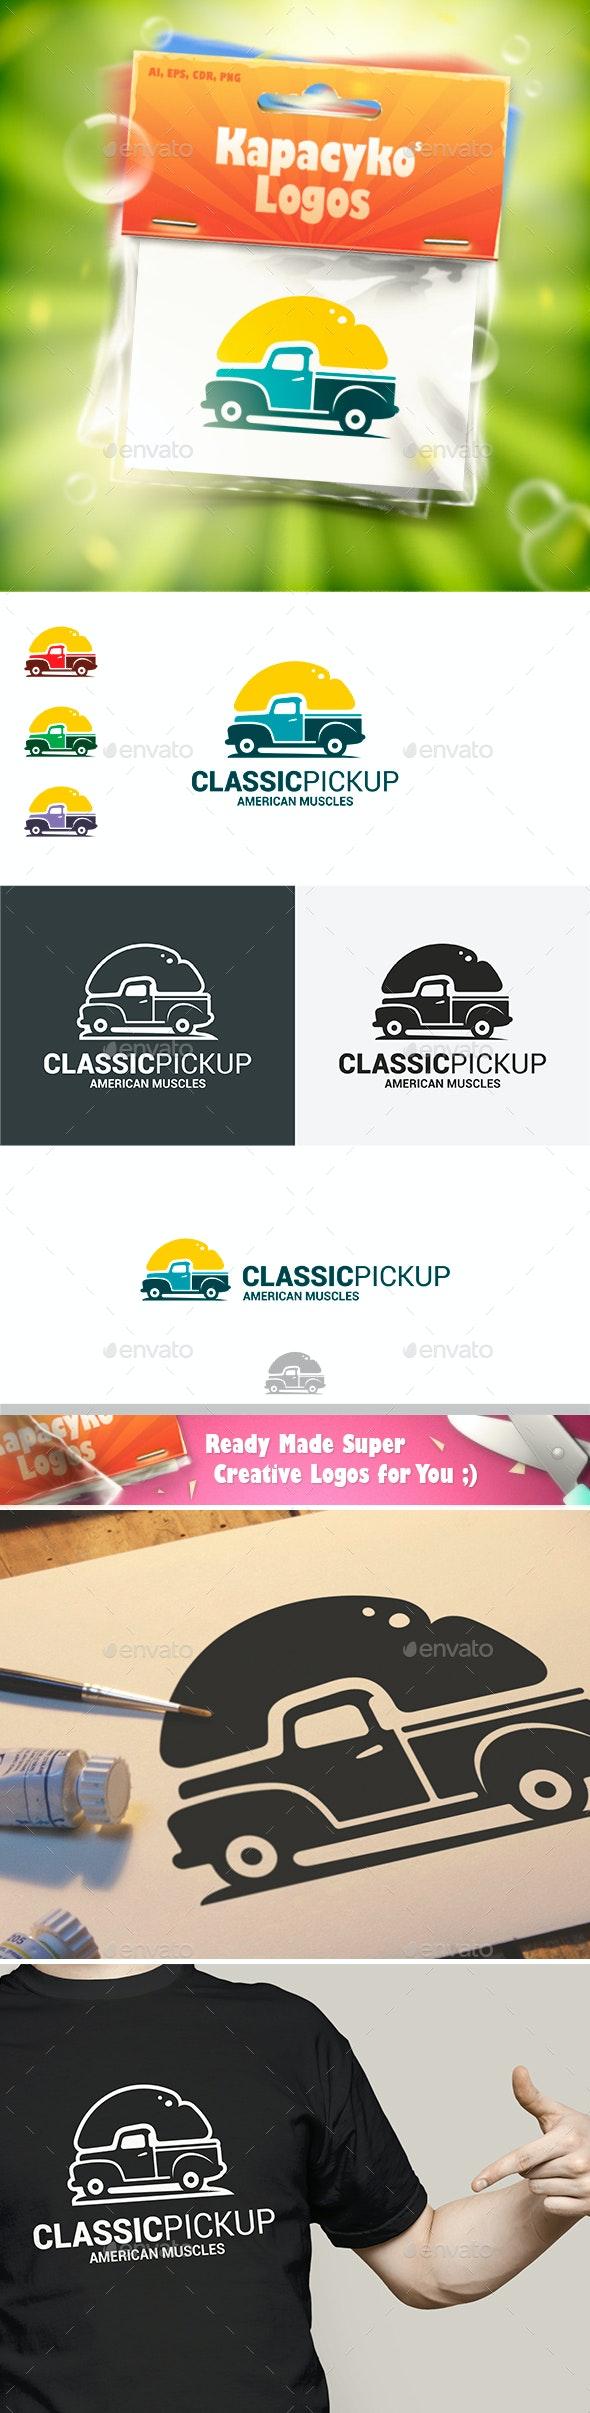 Classic Pickup Logo - Objects Logo Templates